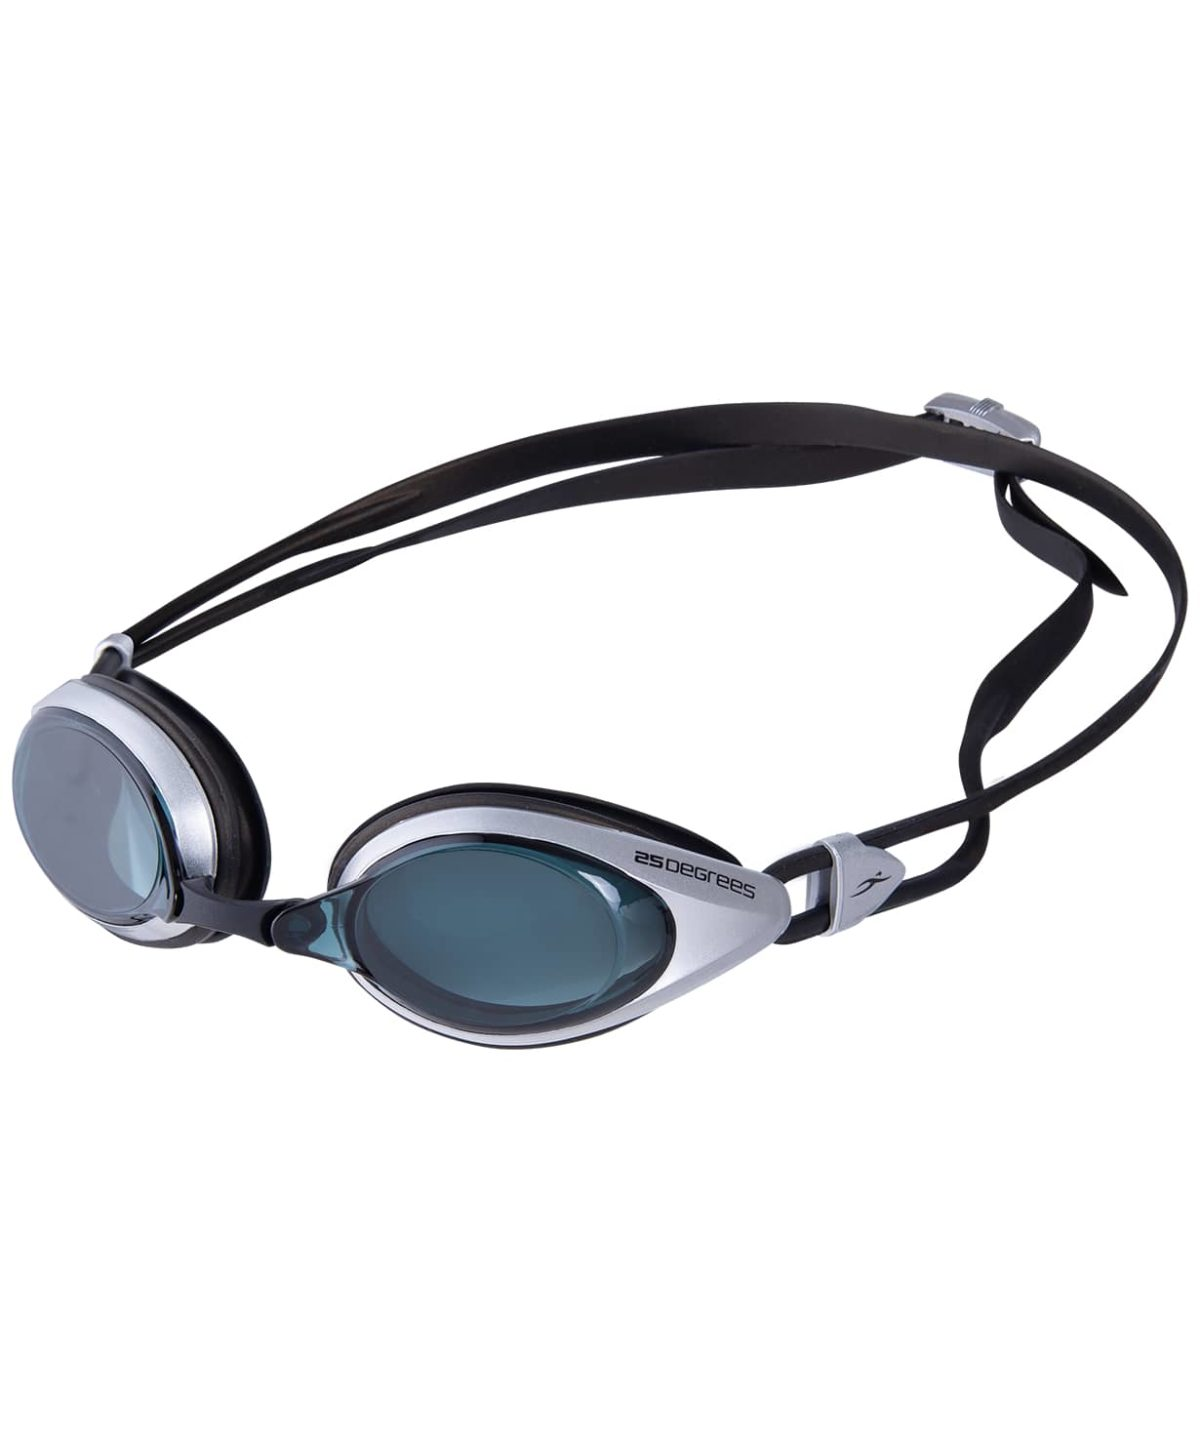 25DEGREES Pulso White/Black Очки для плавания  17352 - 1